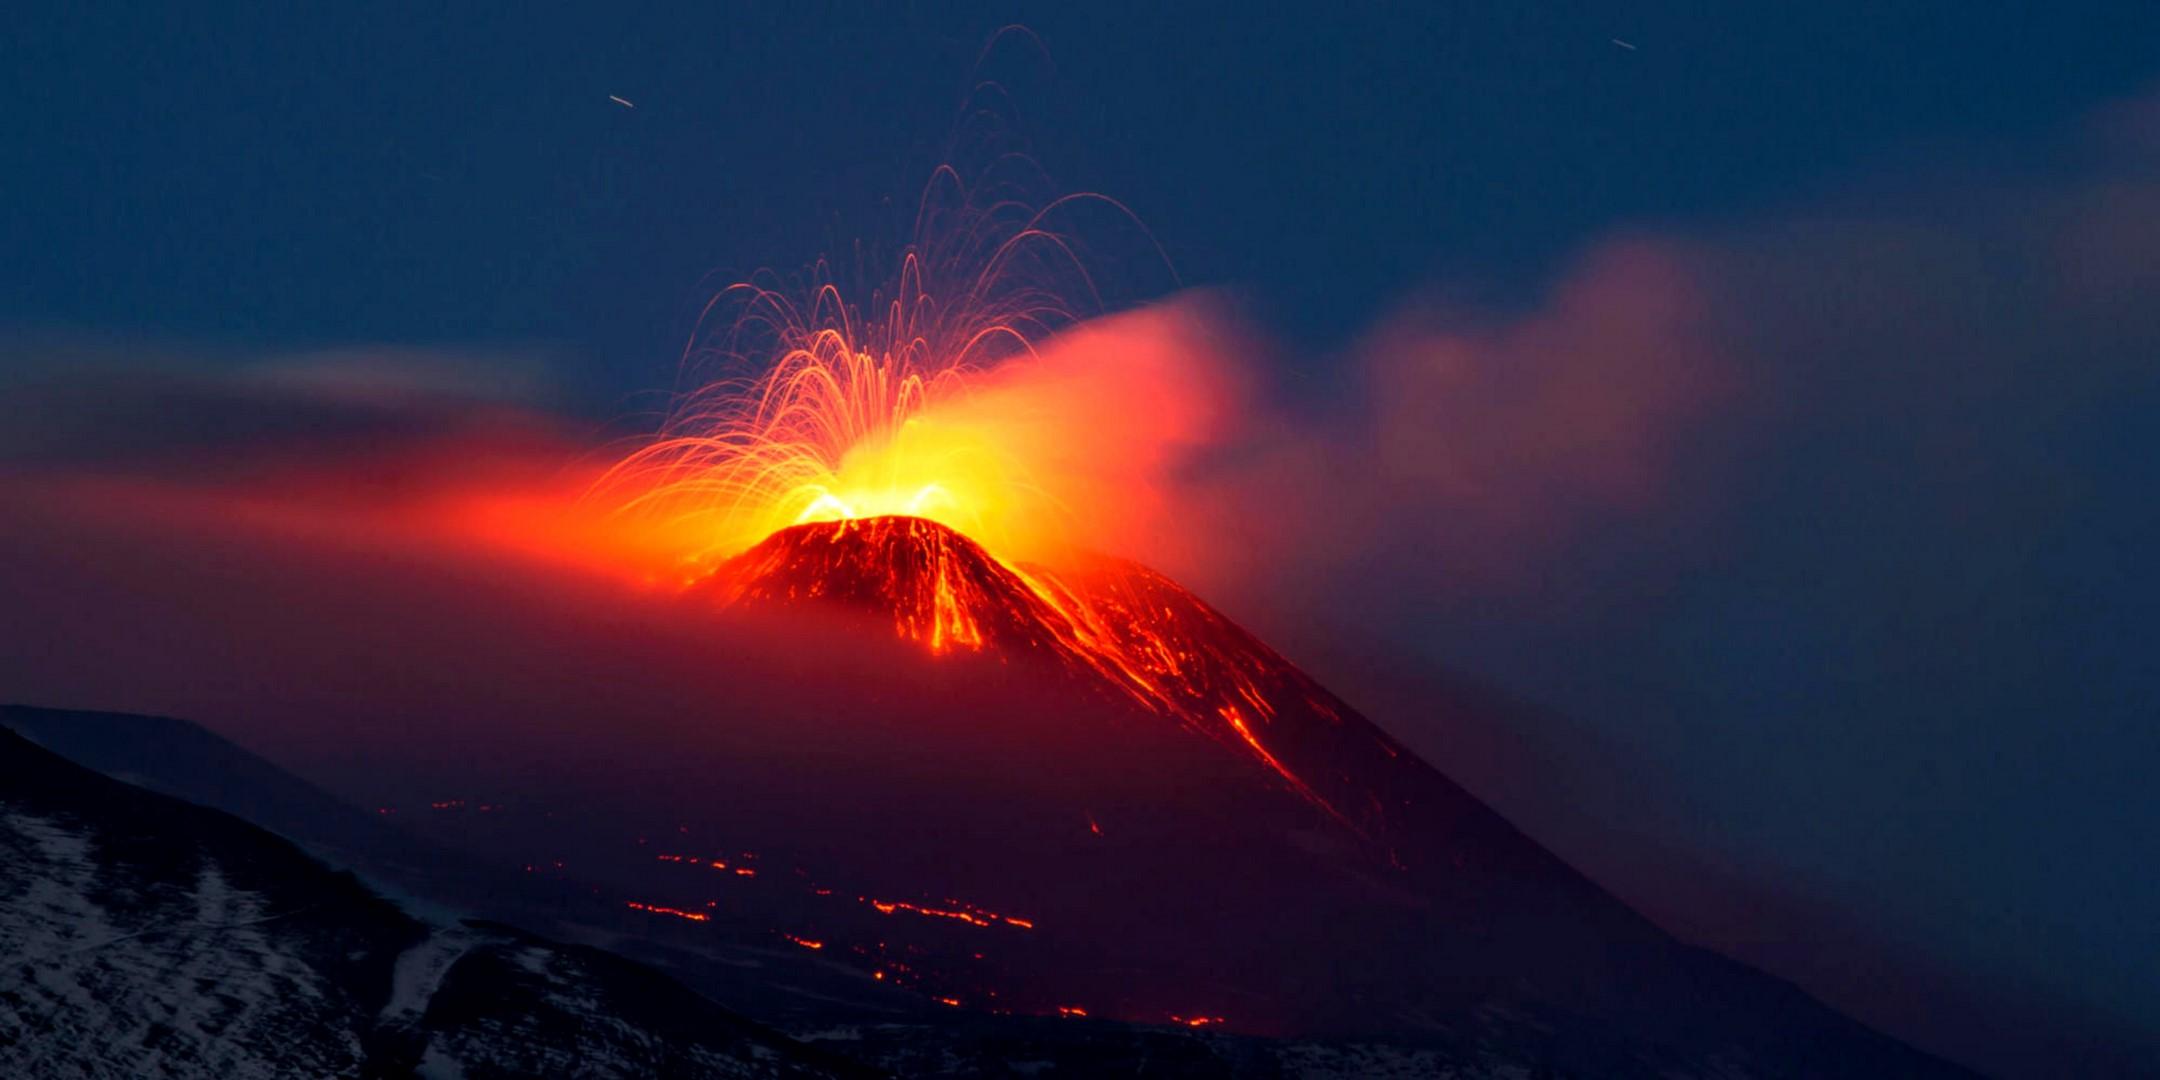 Fondos De Pantalla De Lava: Fondos De Pantalla De Volcanes